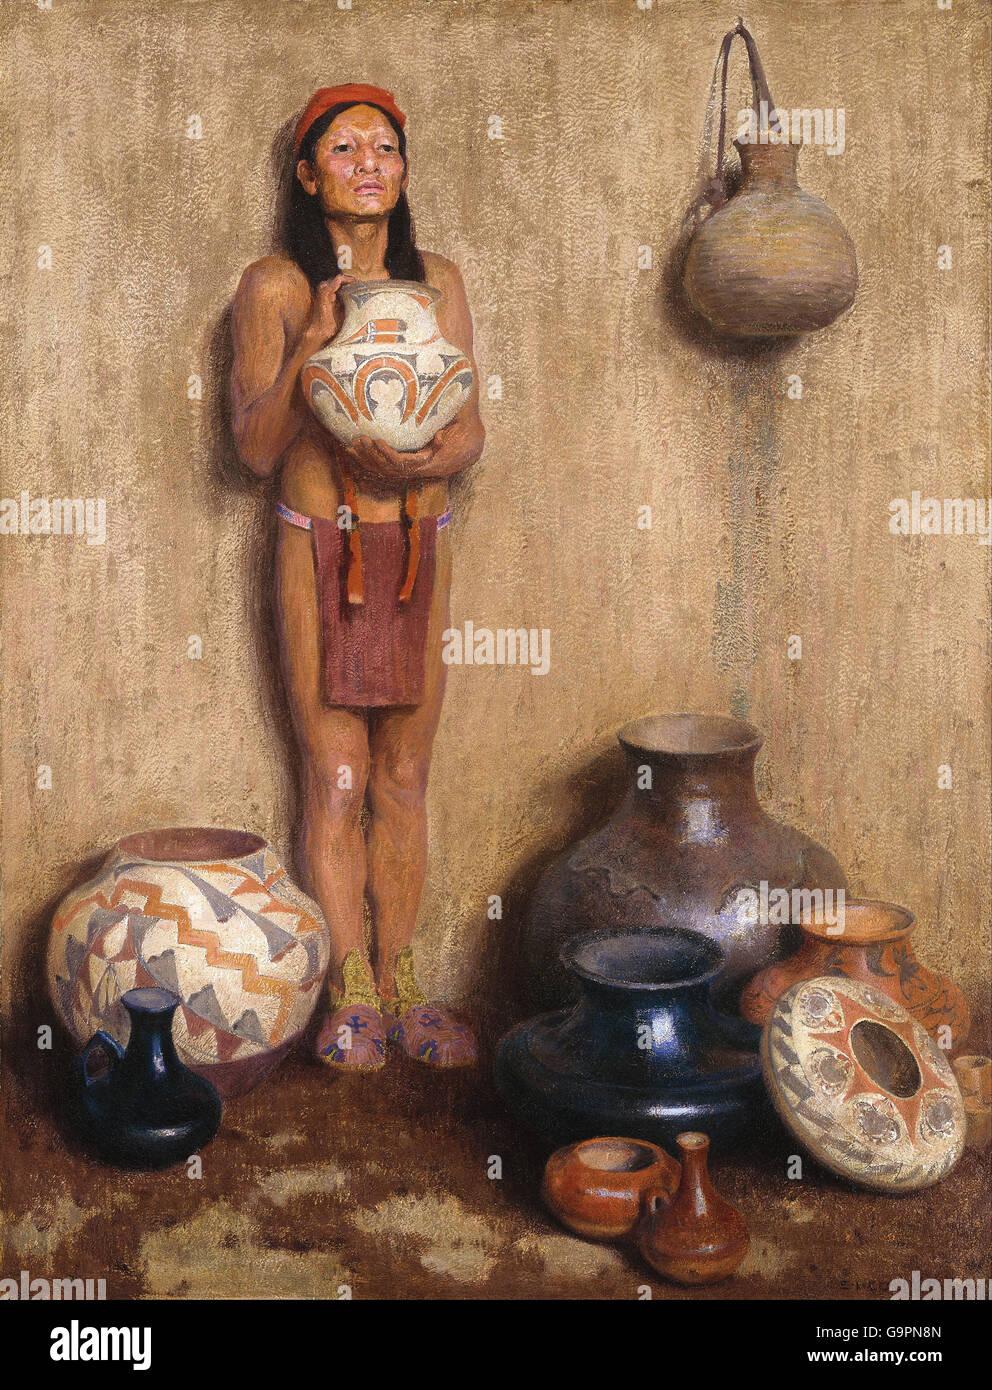 Eanger Irving Couse - Pottery Vendor - Stock Image